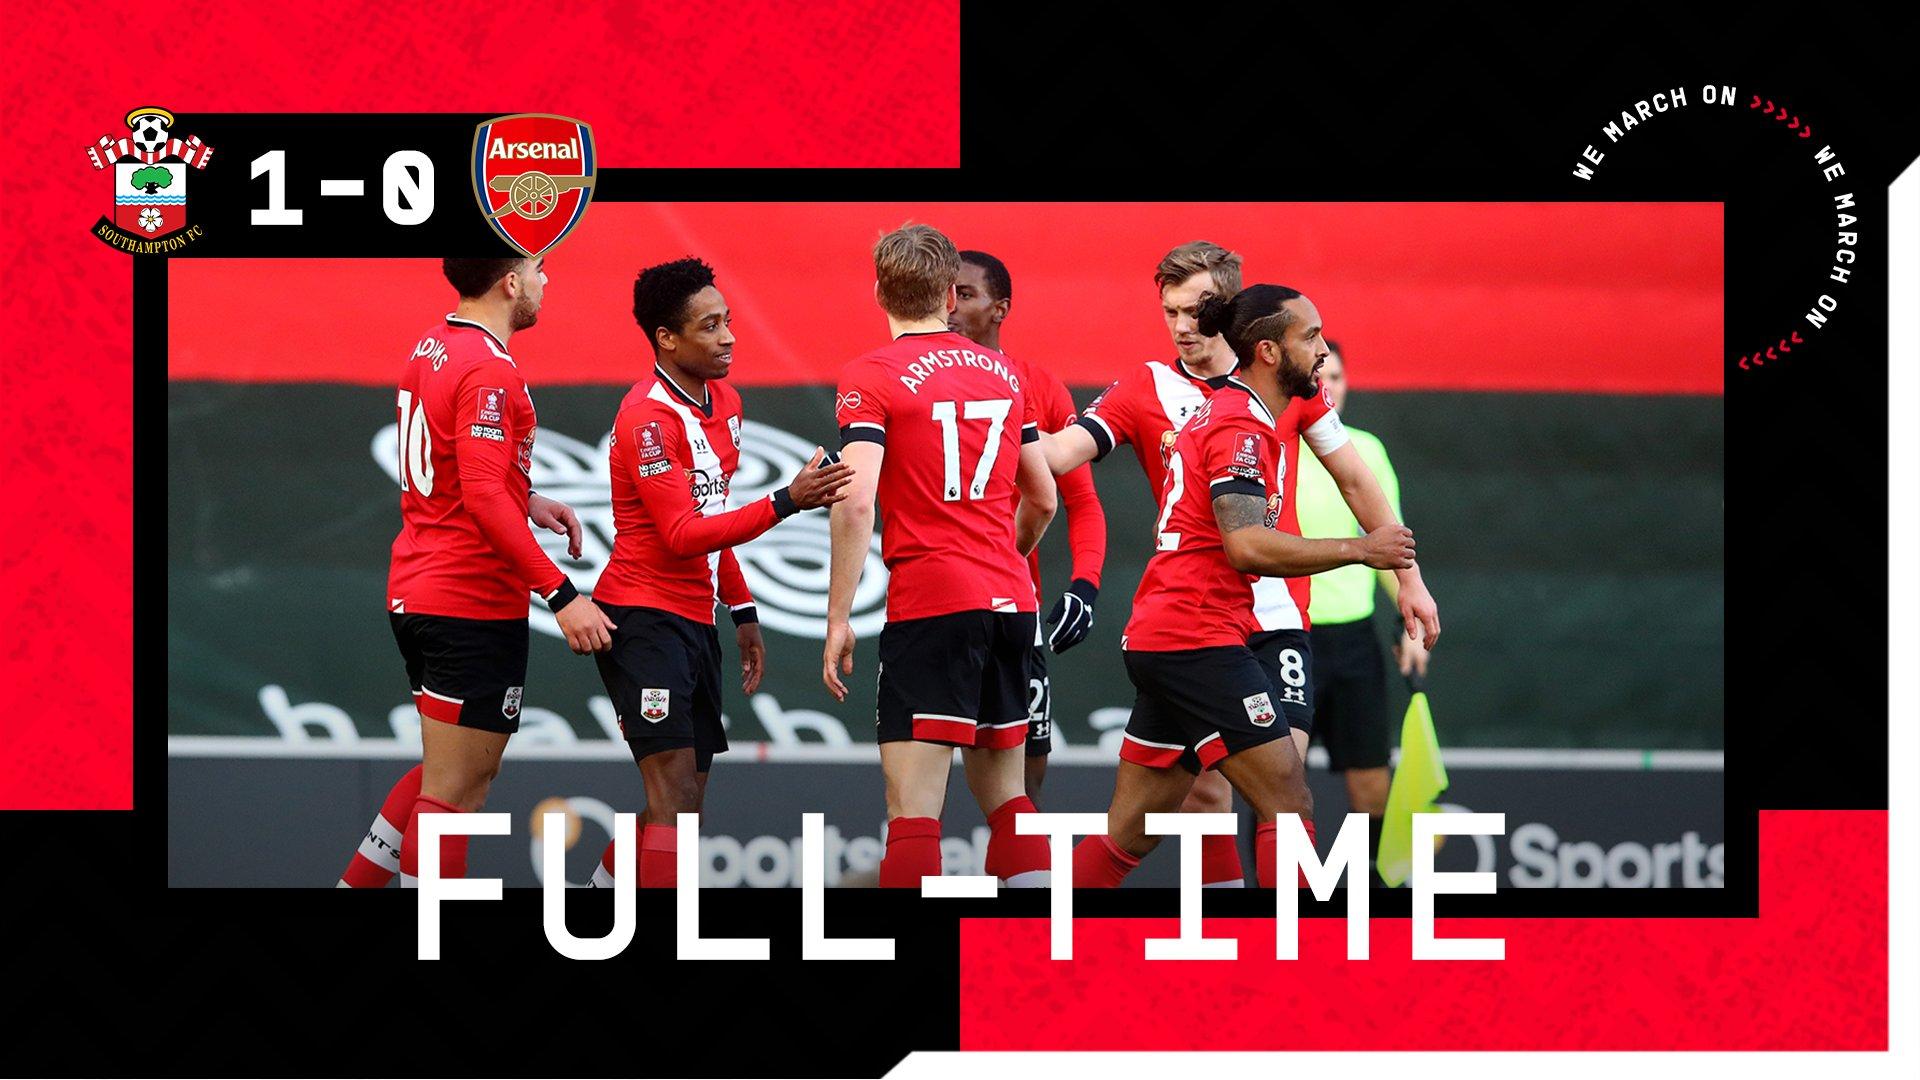 Full-time: Southampton 1-0 Arsenal